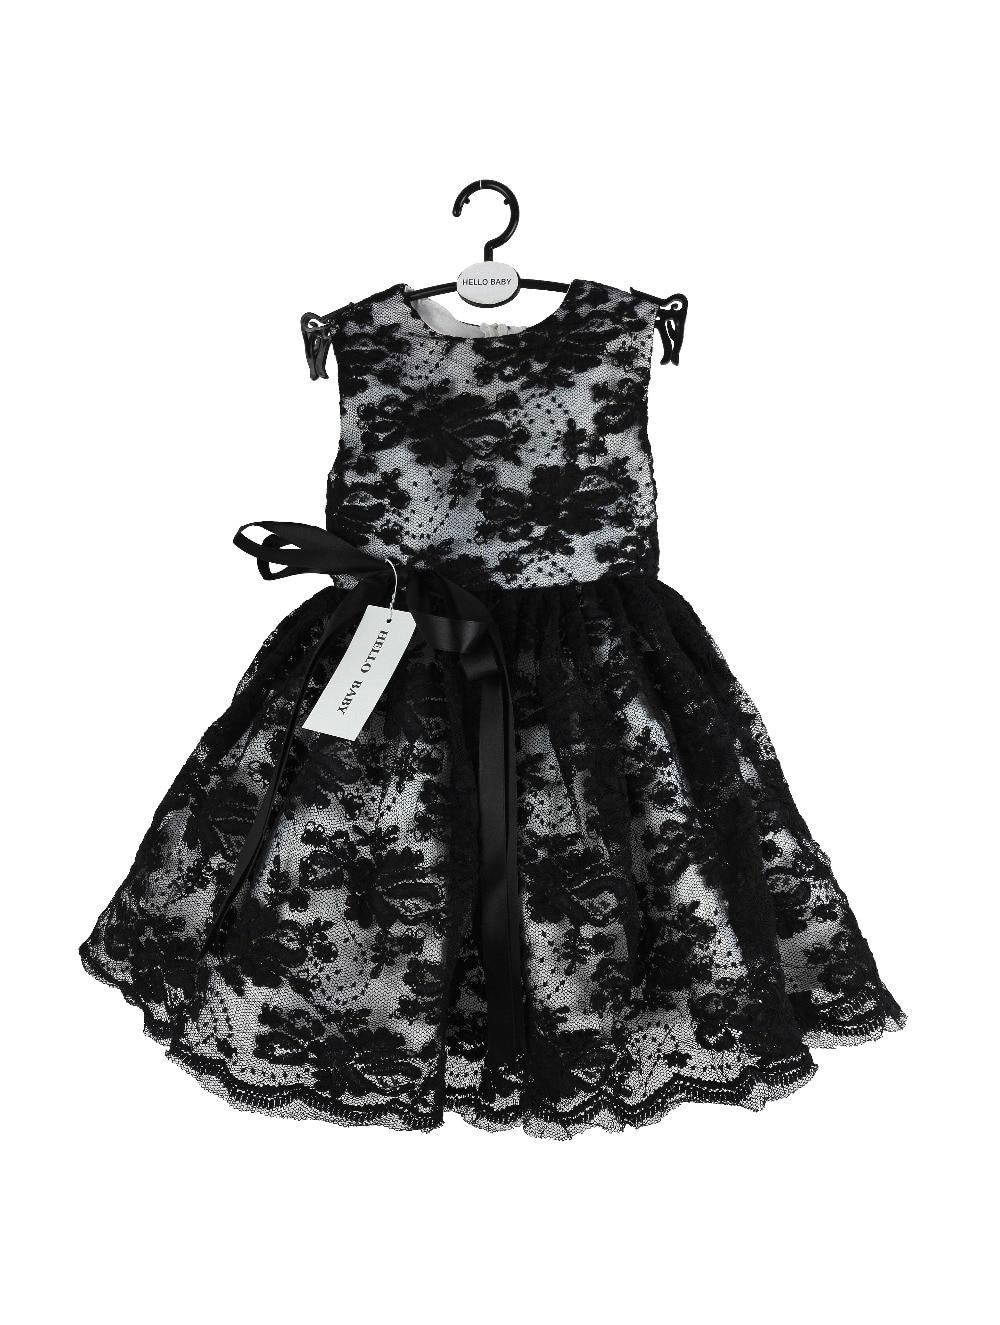 2016 Nobility Lace 1 year girl baby birthday dress,Black summer style Vestidos for New born baby girls 1249